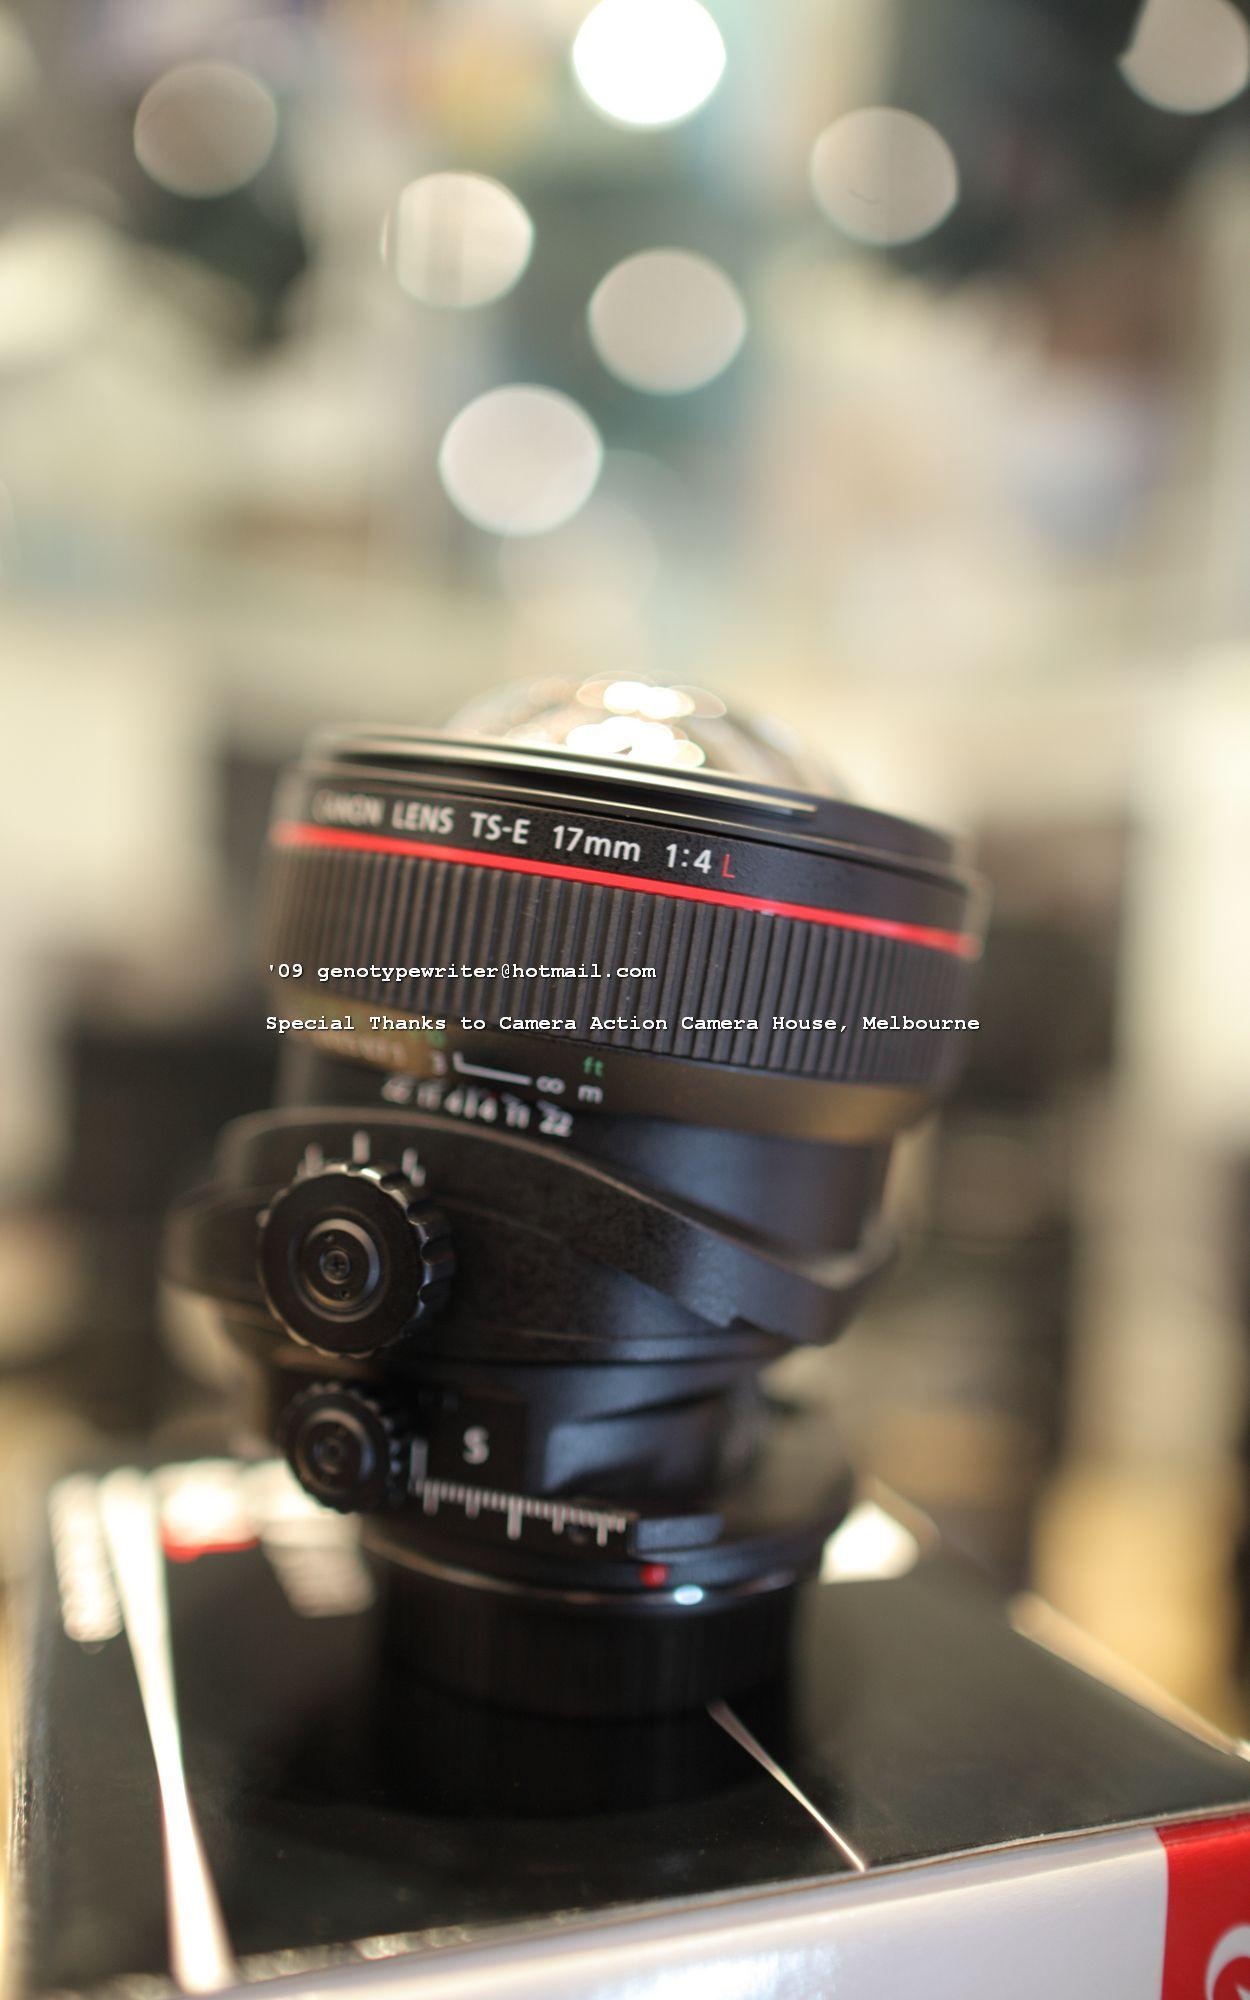 Canon Ts E 17 Mm F4 0 L Tilt Shift Lens Photo Gear Tilt Shift Tilt Shift Lens